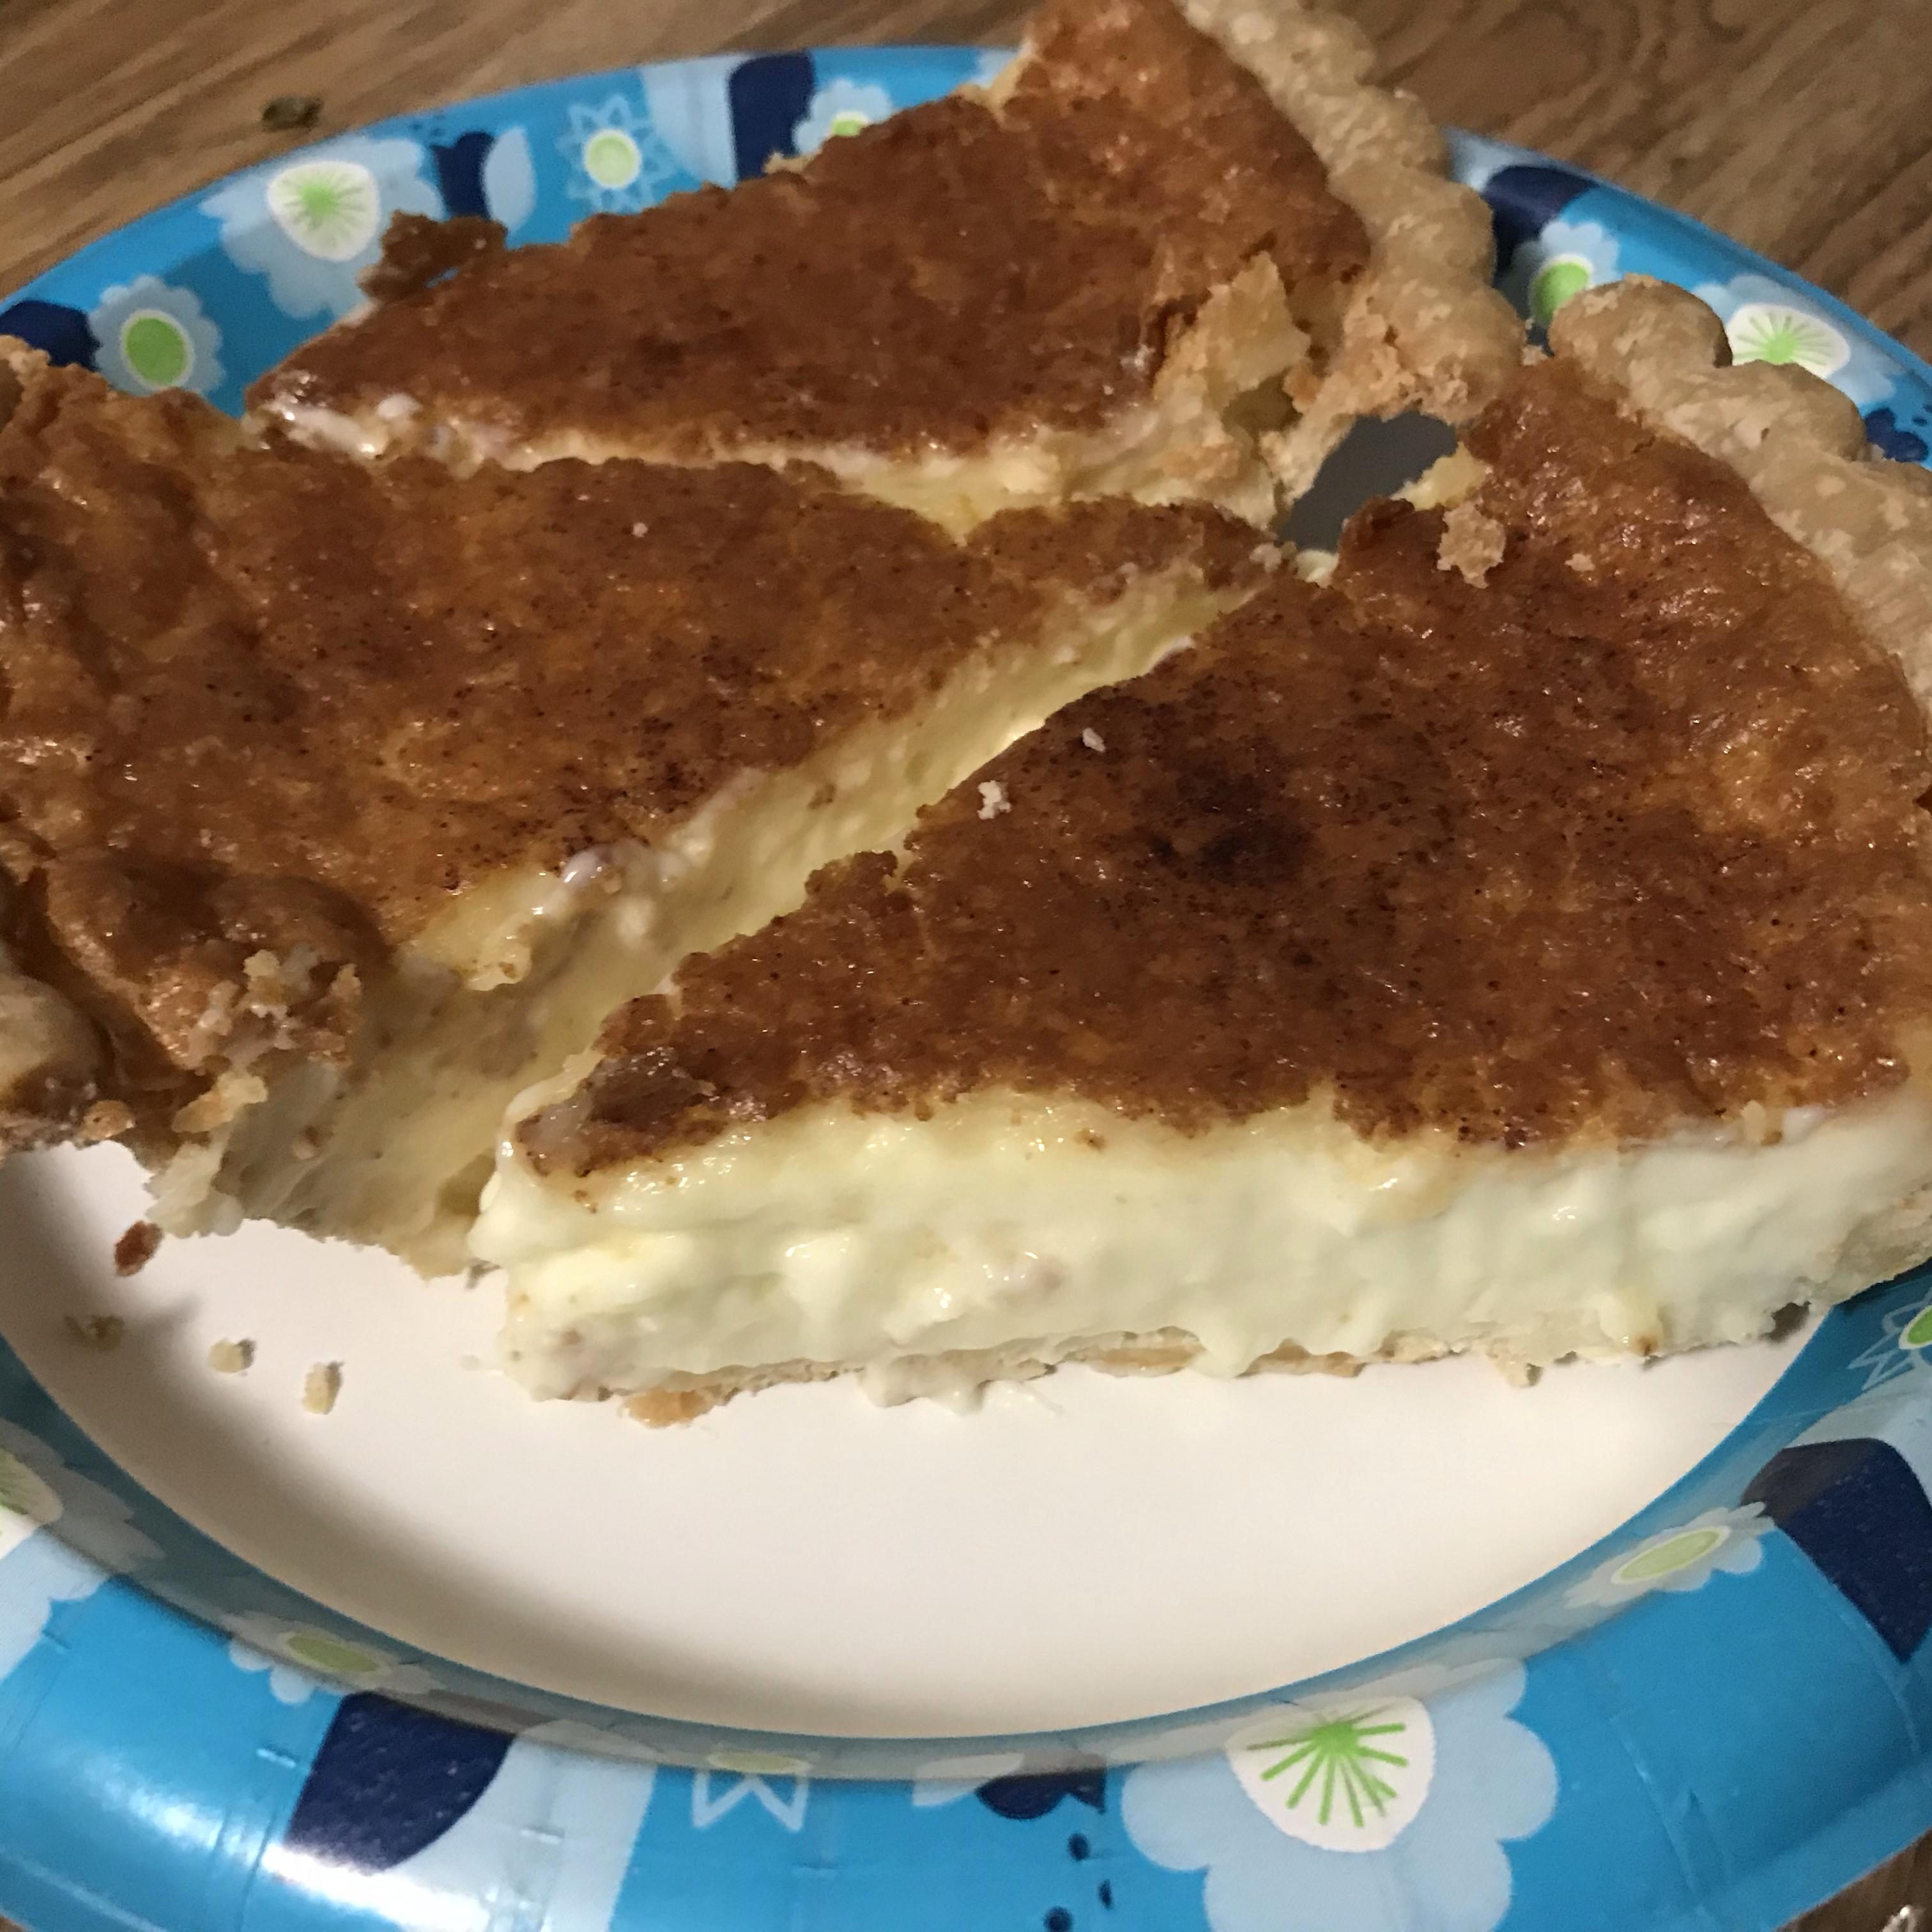 Old Fashioned Cream Pie Jeannie Orr-Shears